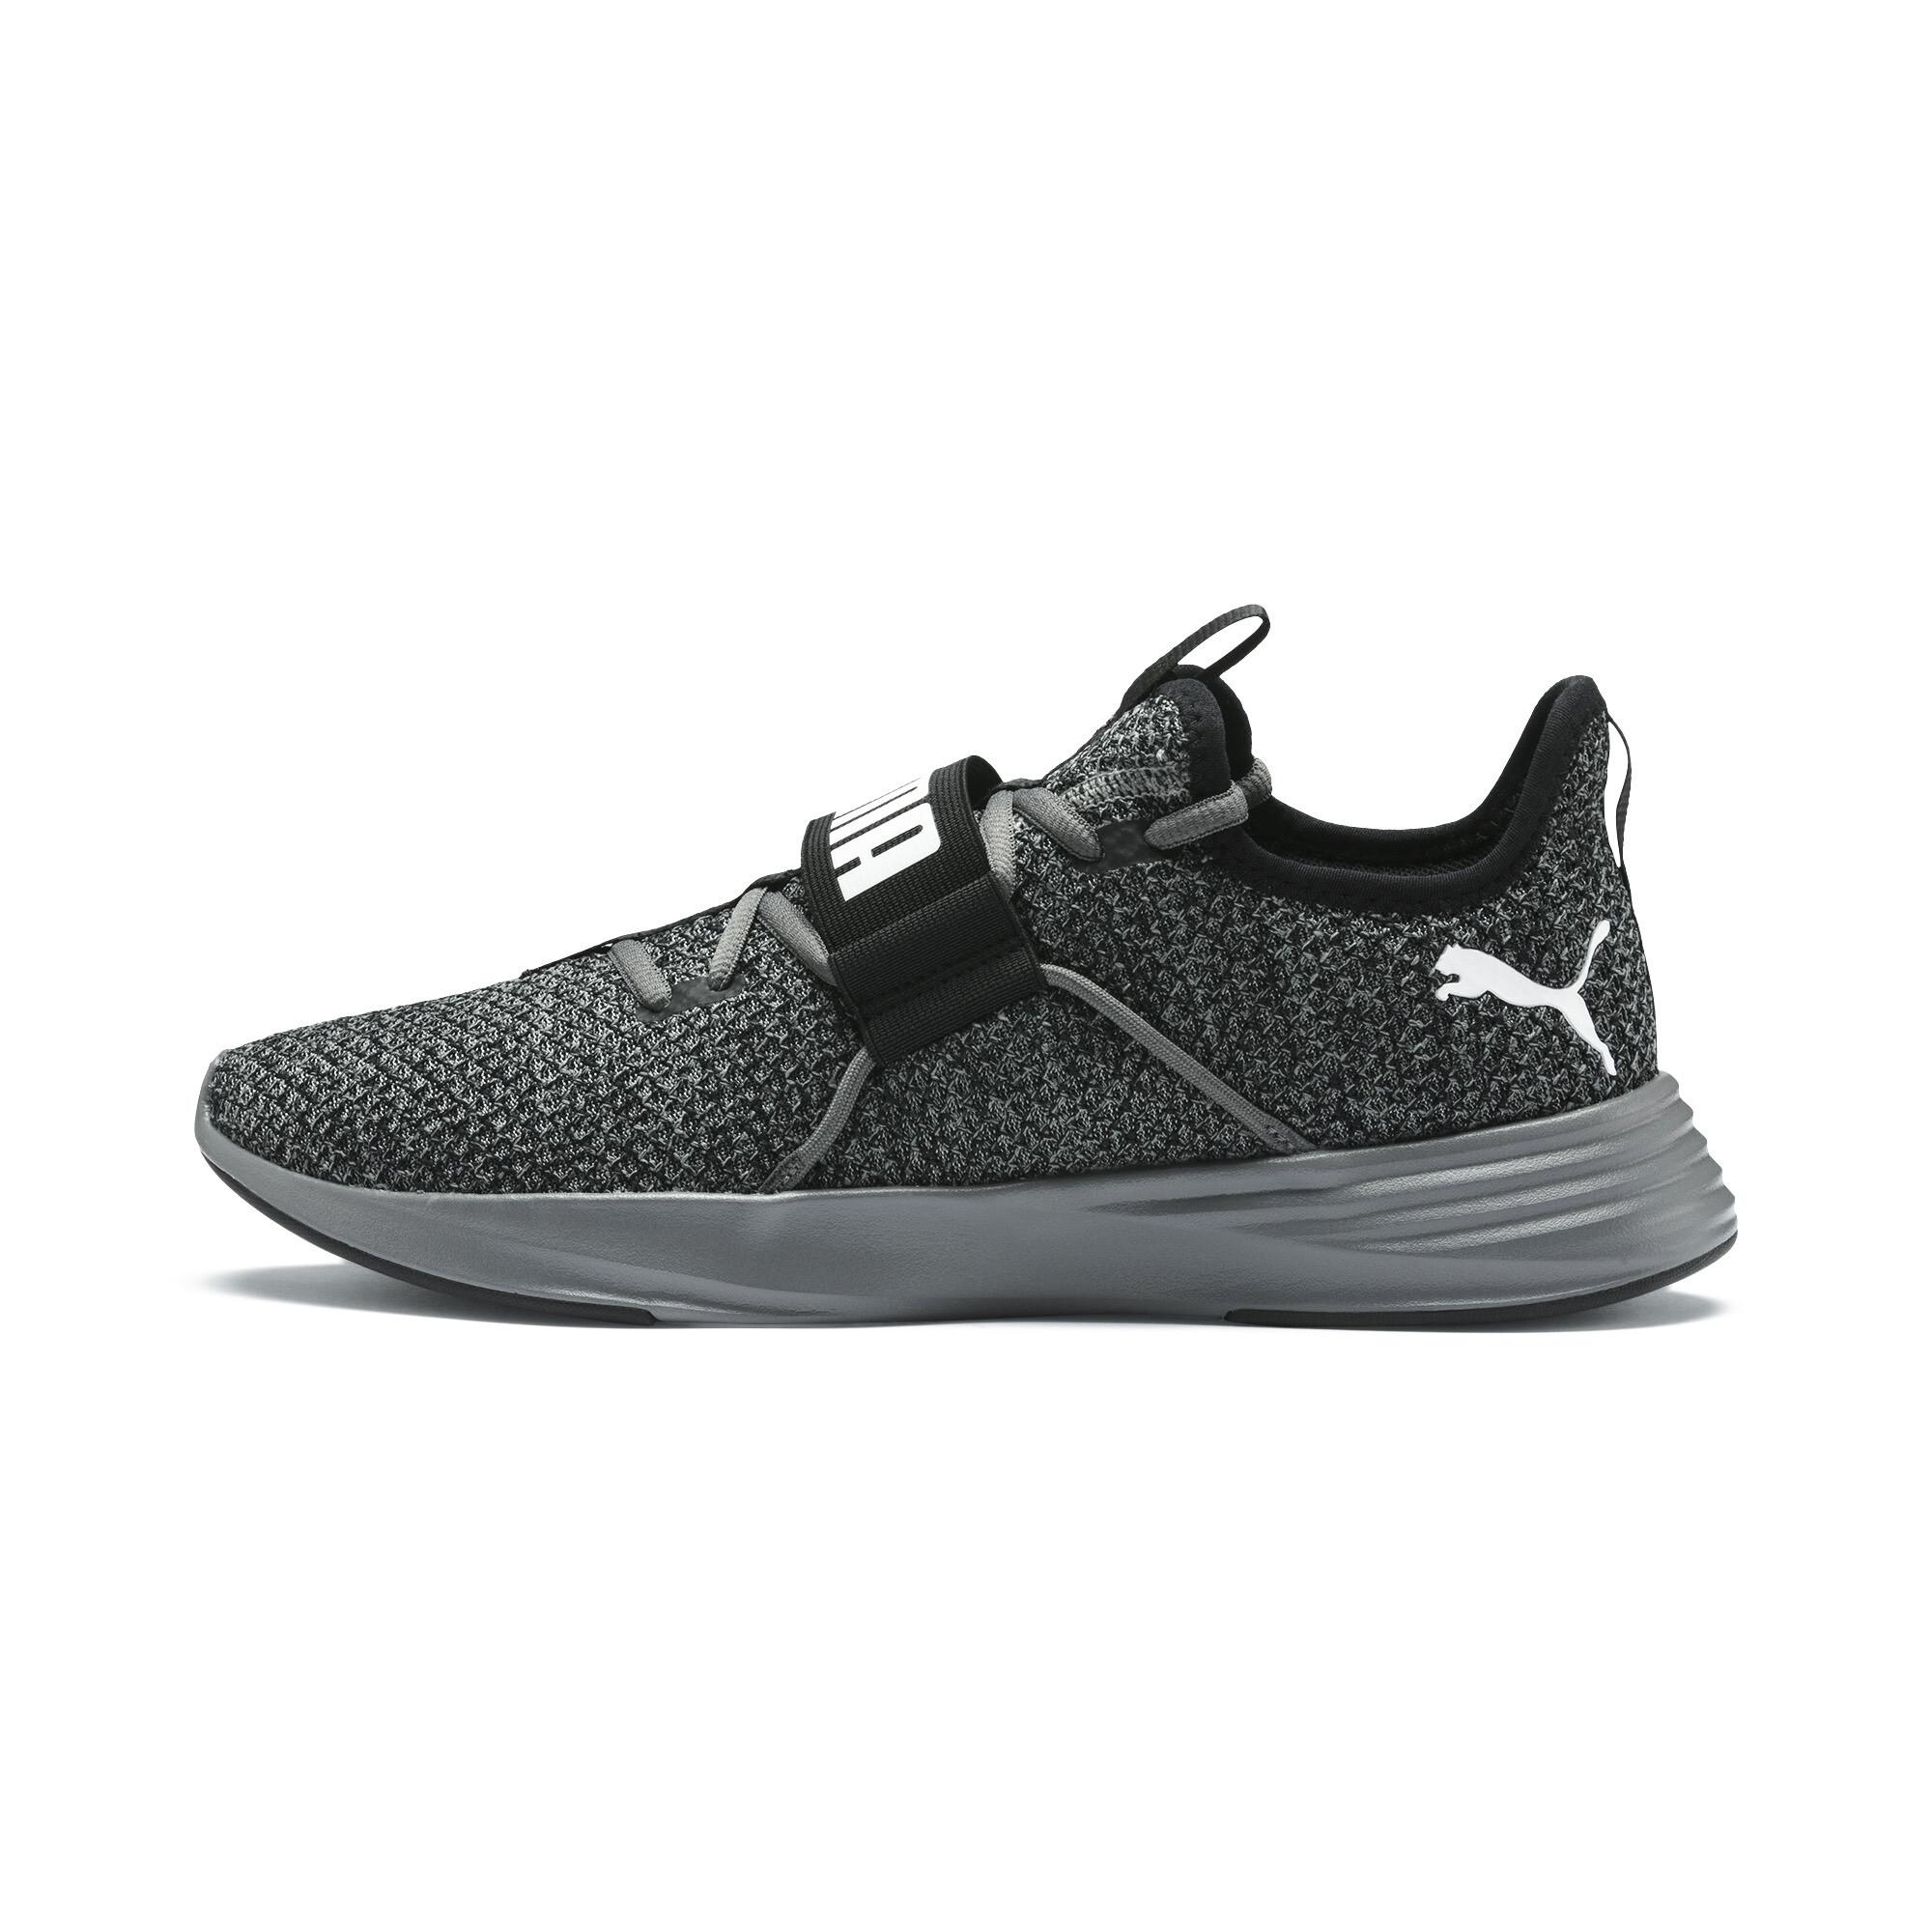 PUMA-Men-039-s-Persist-XT-Knit-Training-Shoes thumbnail 11